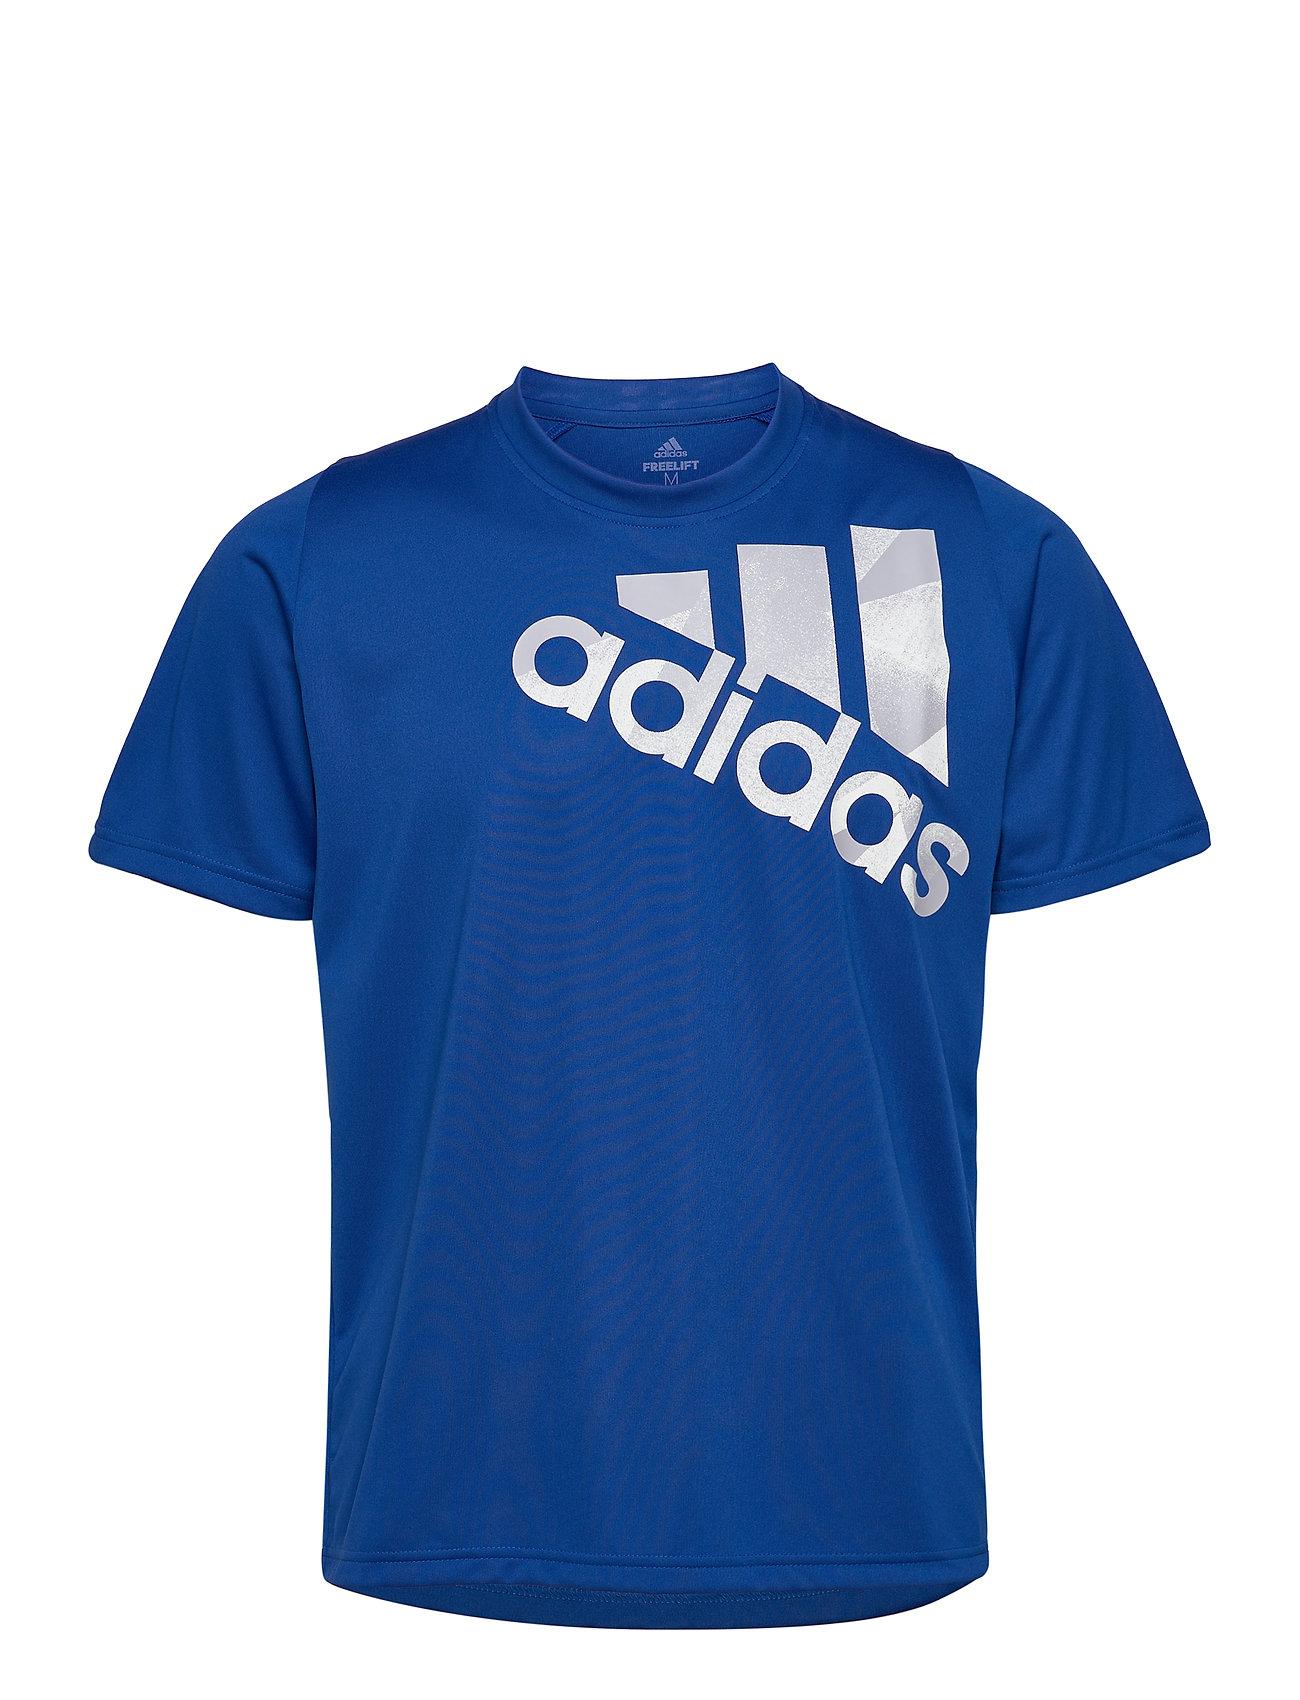 Image of Tky Oly Bos Tee T-shirt Blå Adidas Performance (3434452173)